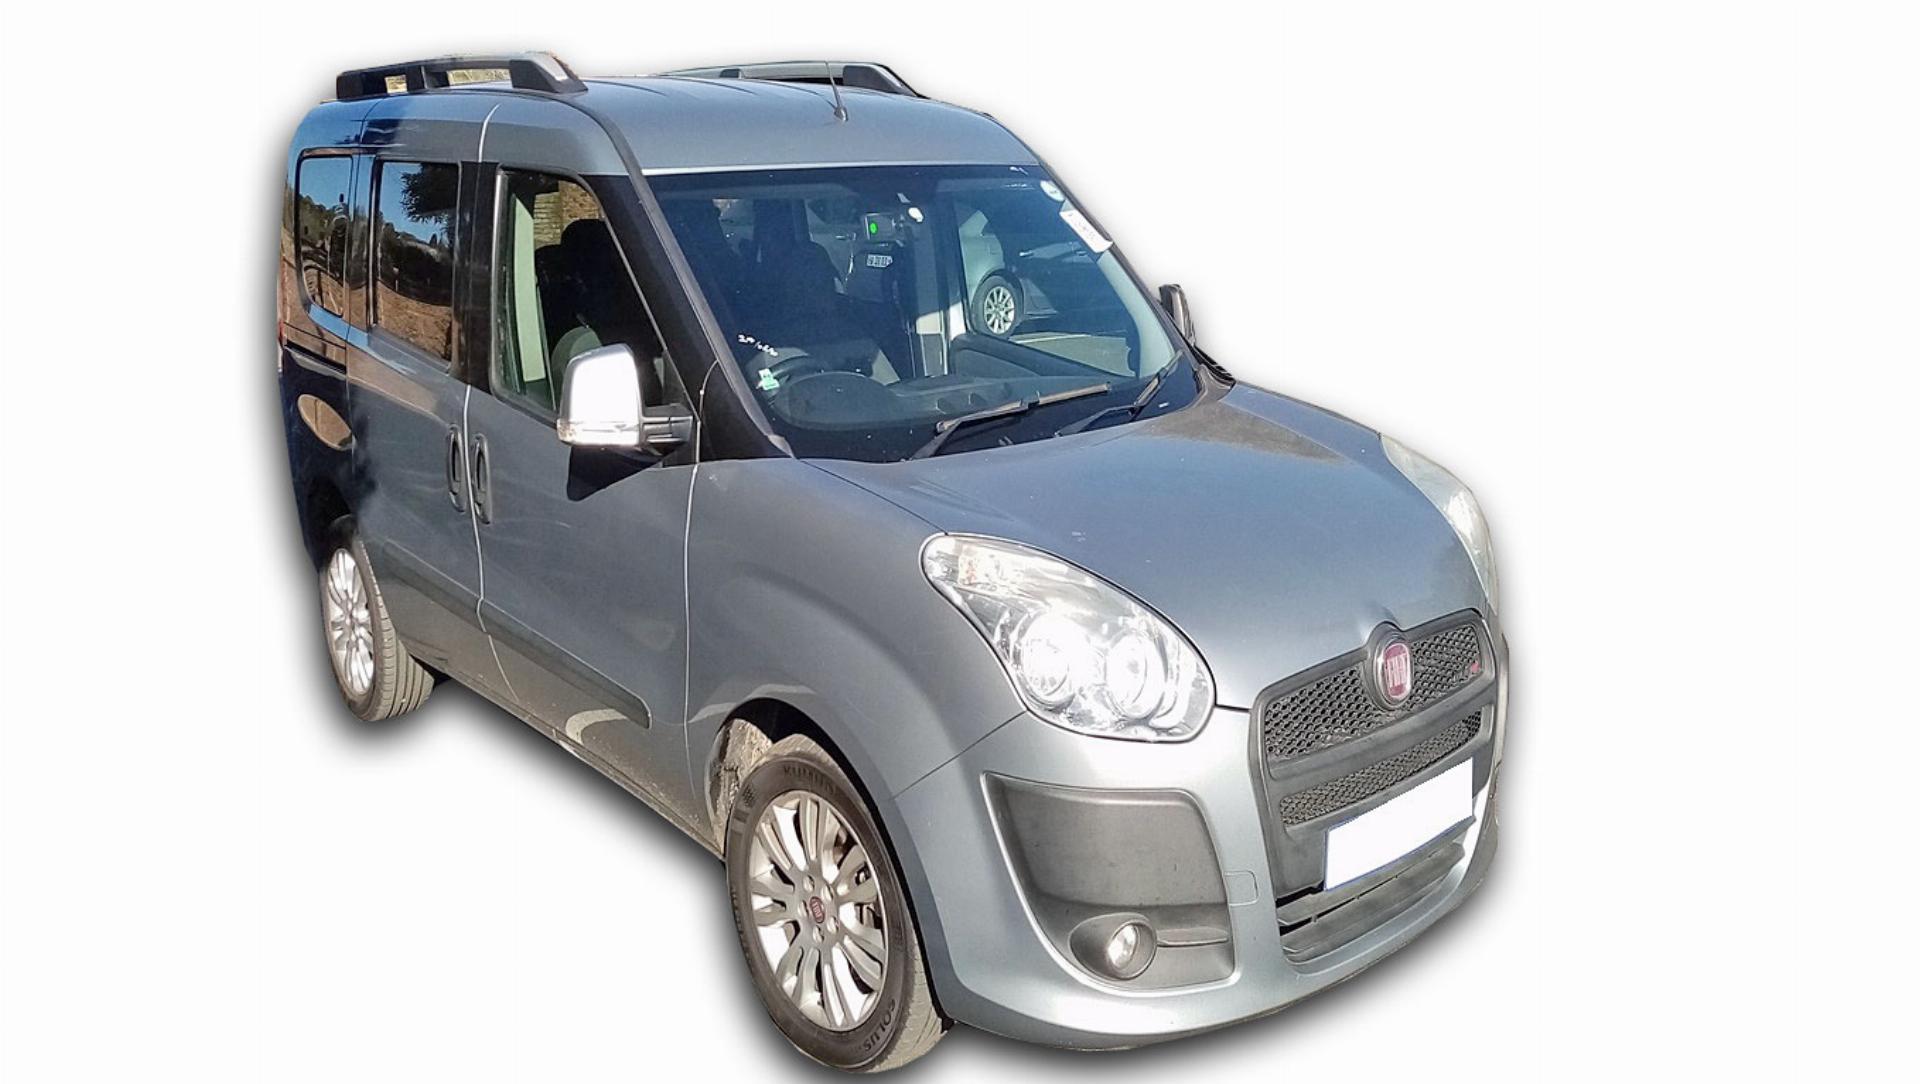 Fiat Doblo Cargo Panorama Multijet 1.6